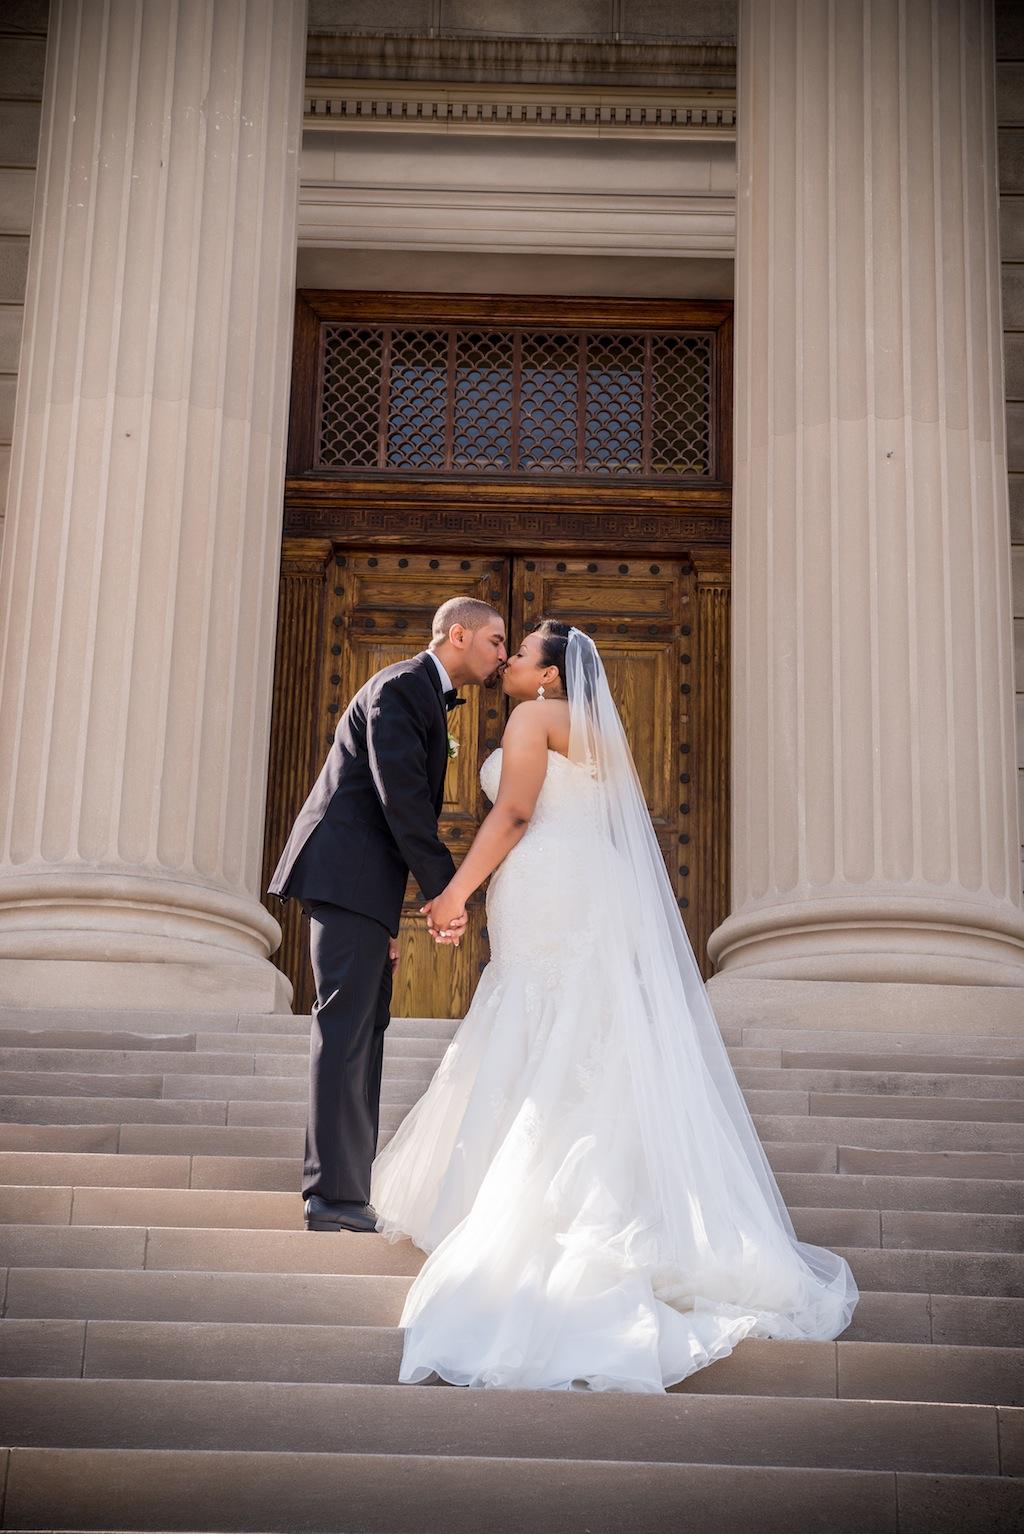 1-15-16-gold-classic-ballroom-wedding-plaza-hotel-dc-1